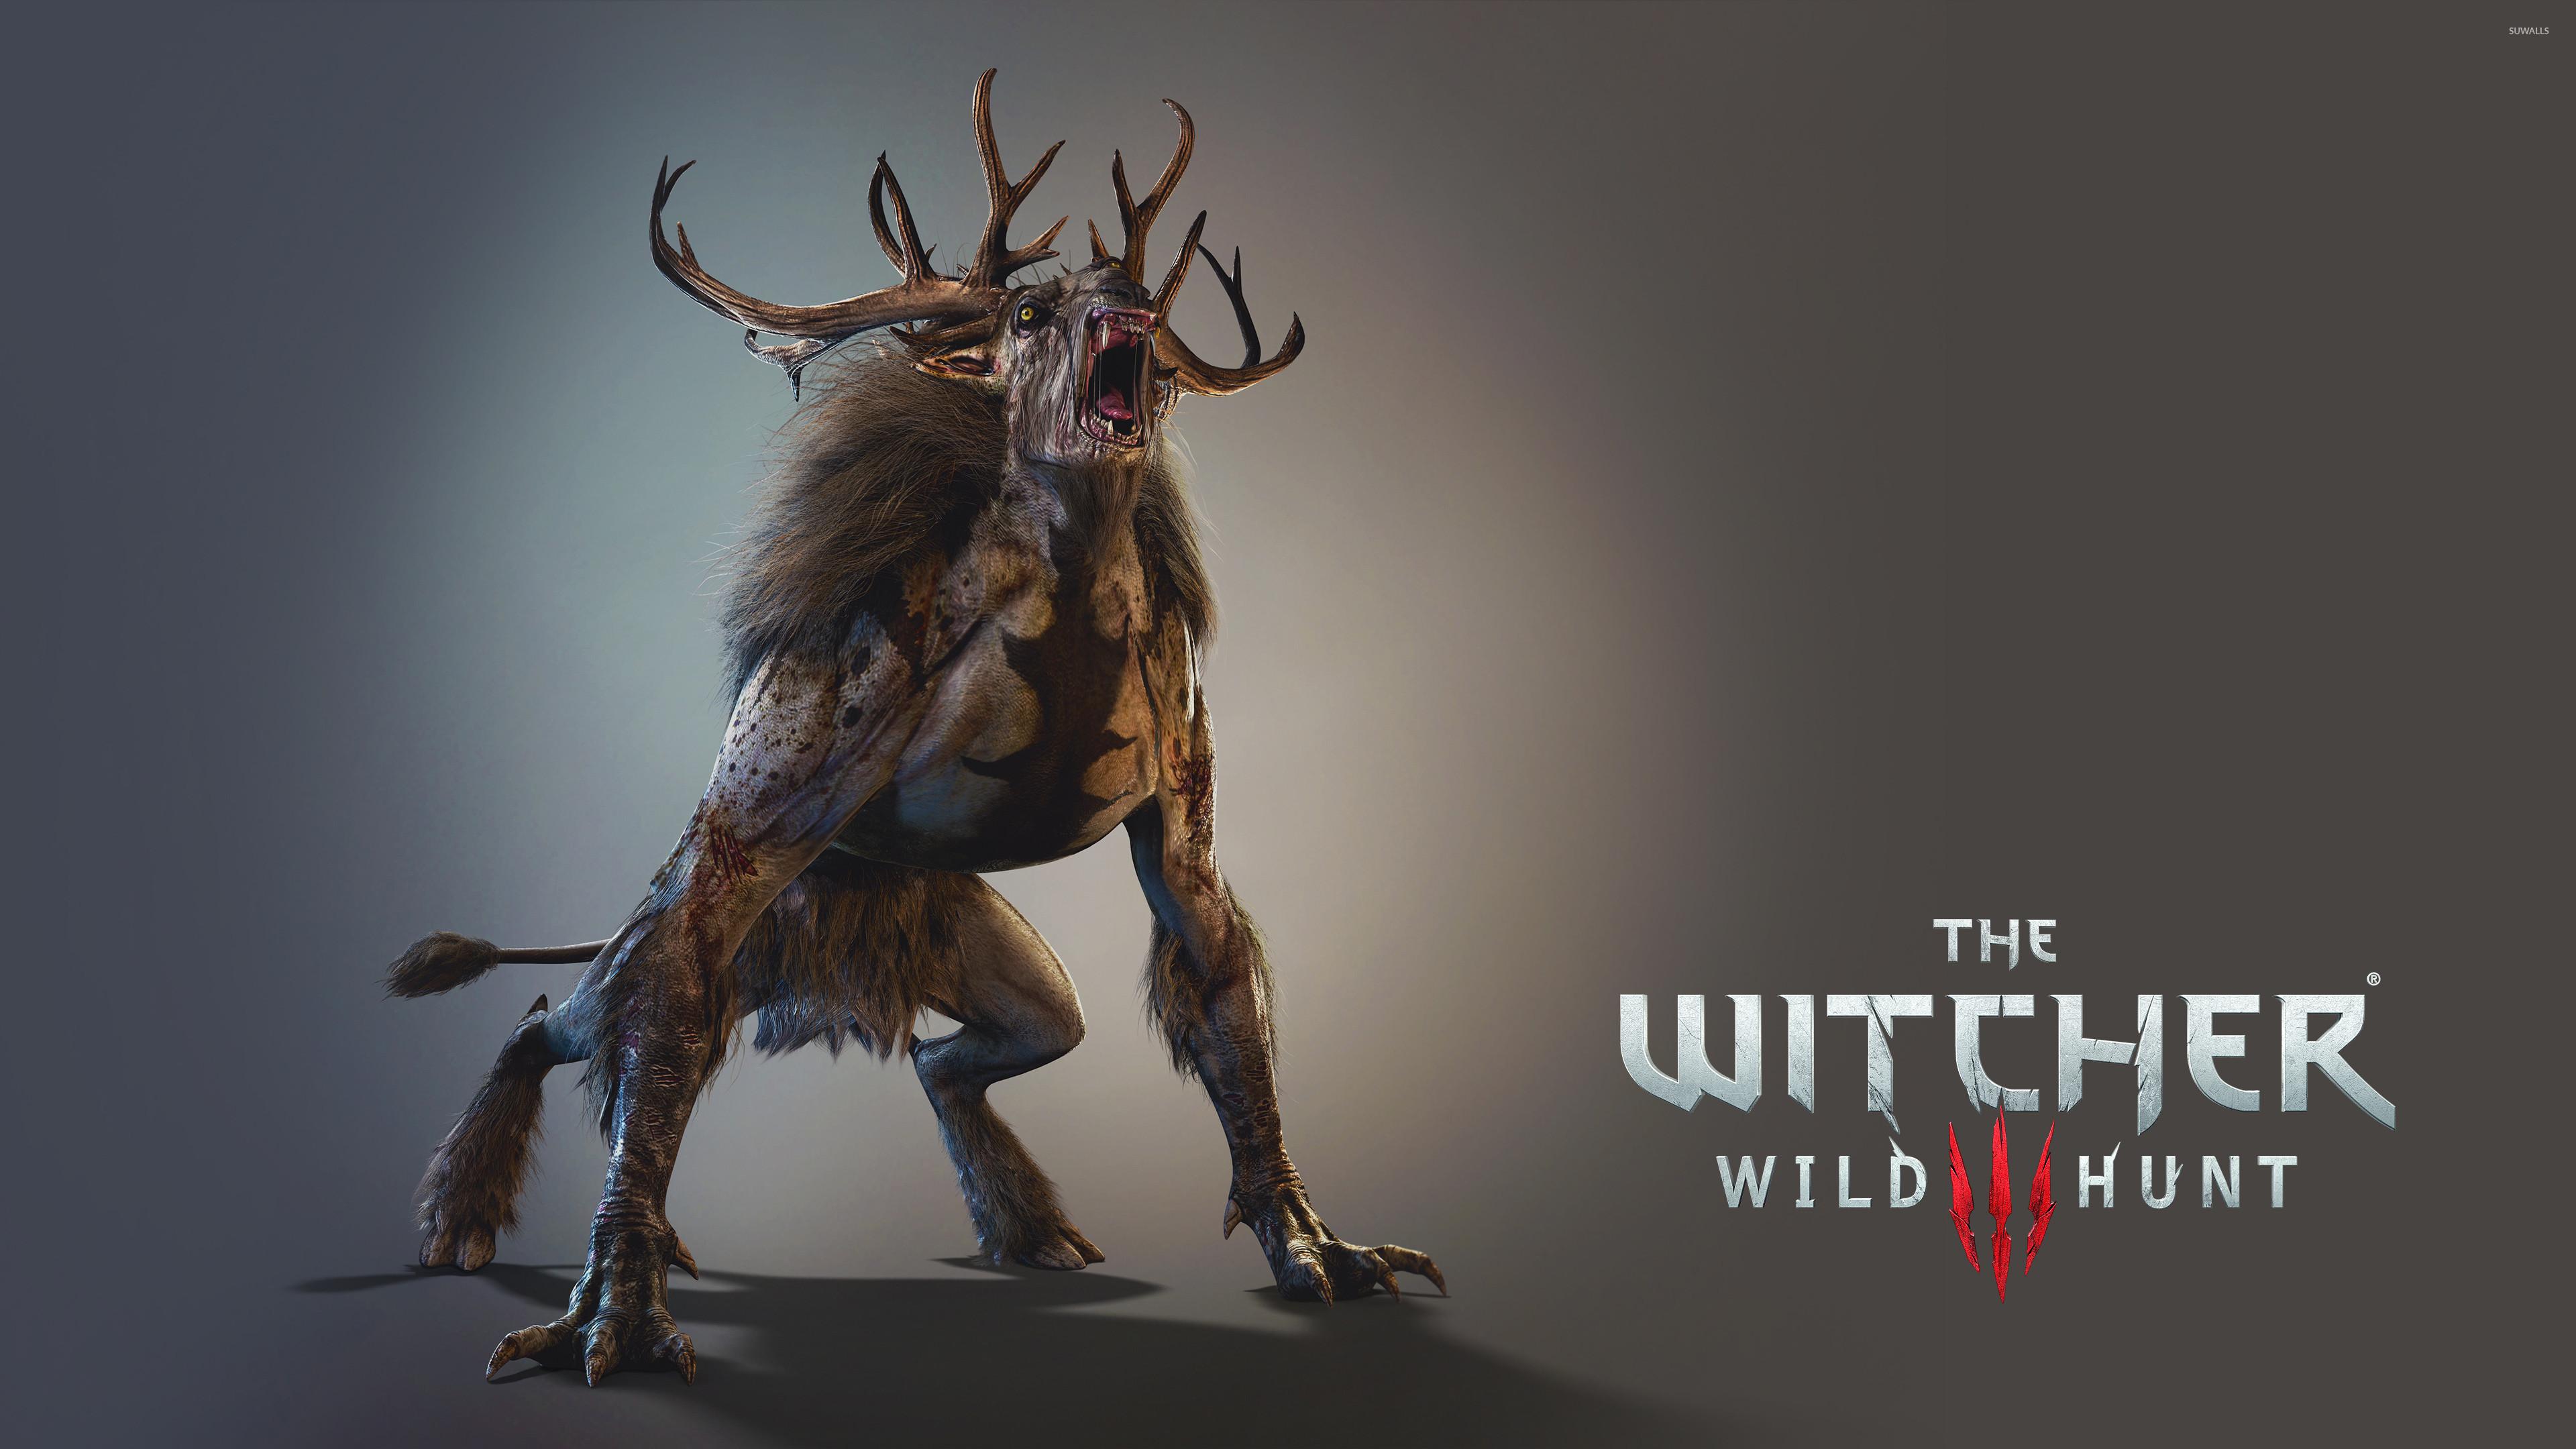 Fiend roaring – The Witcher 3: Wild Hunt wallpaper jpg